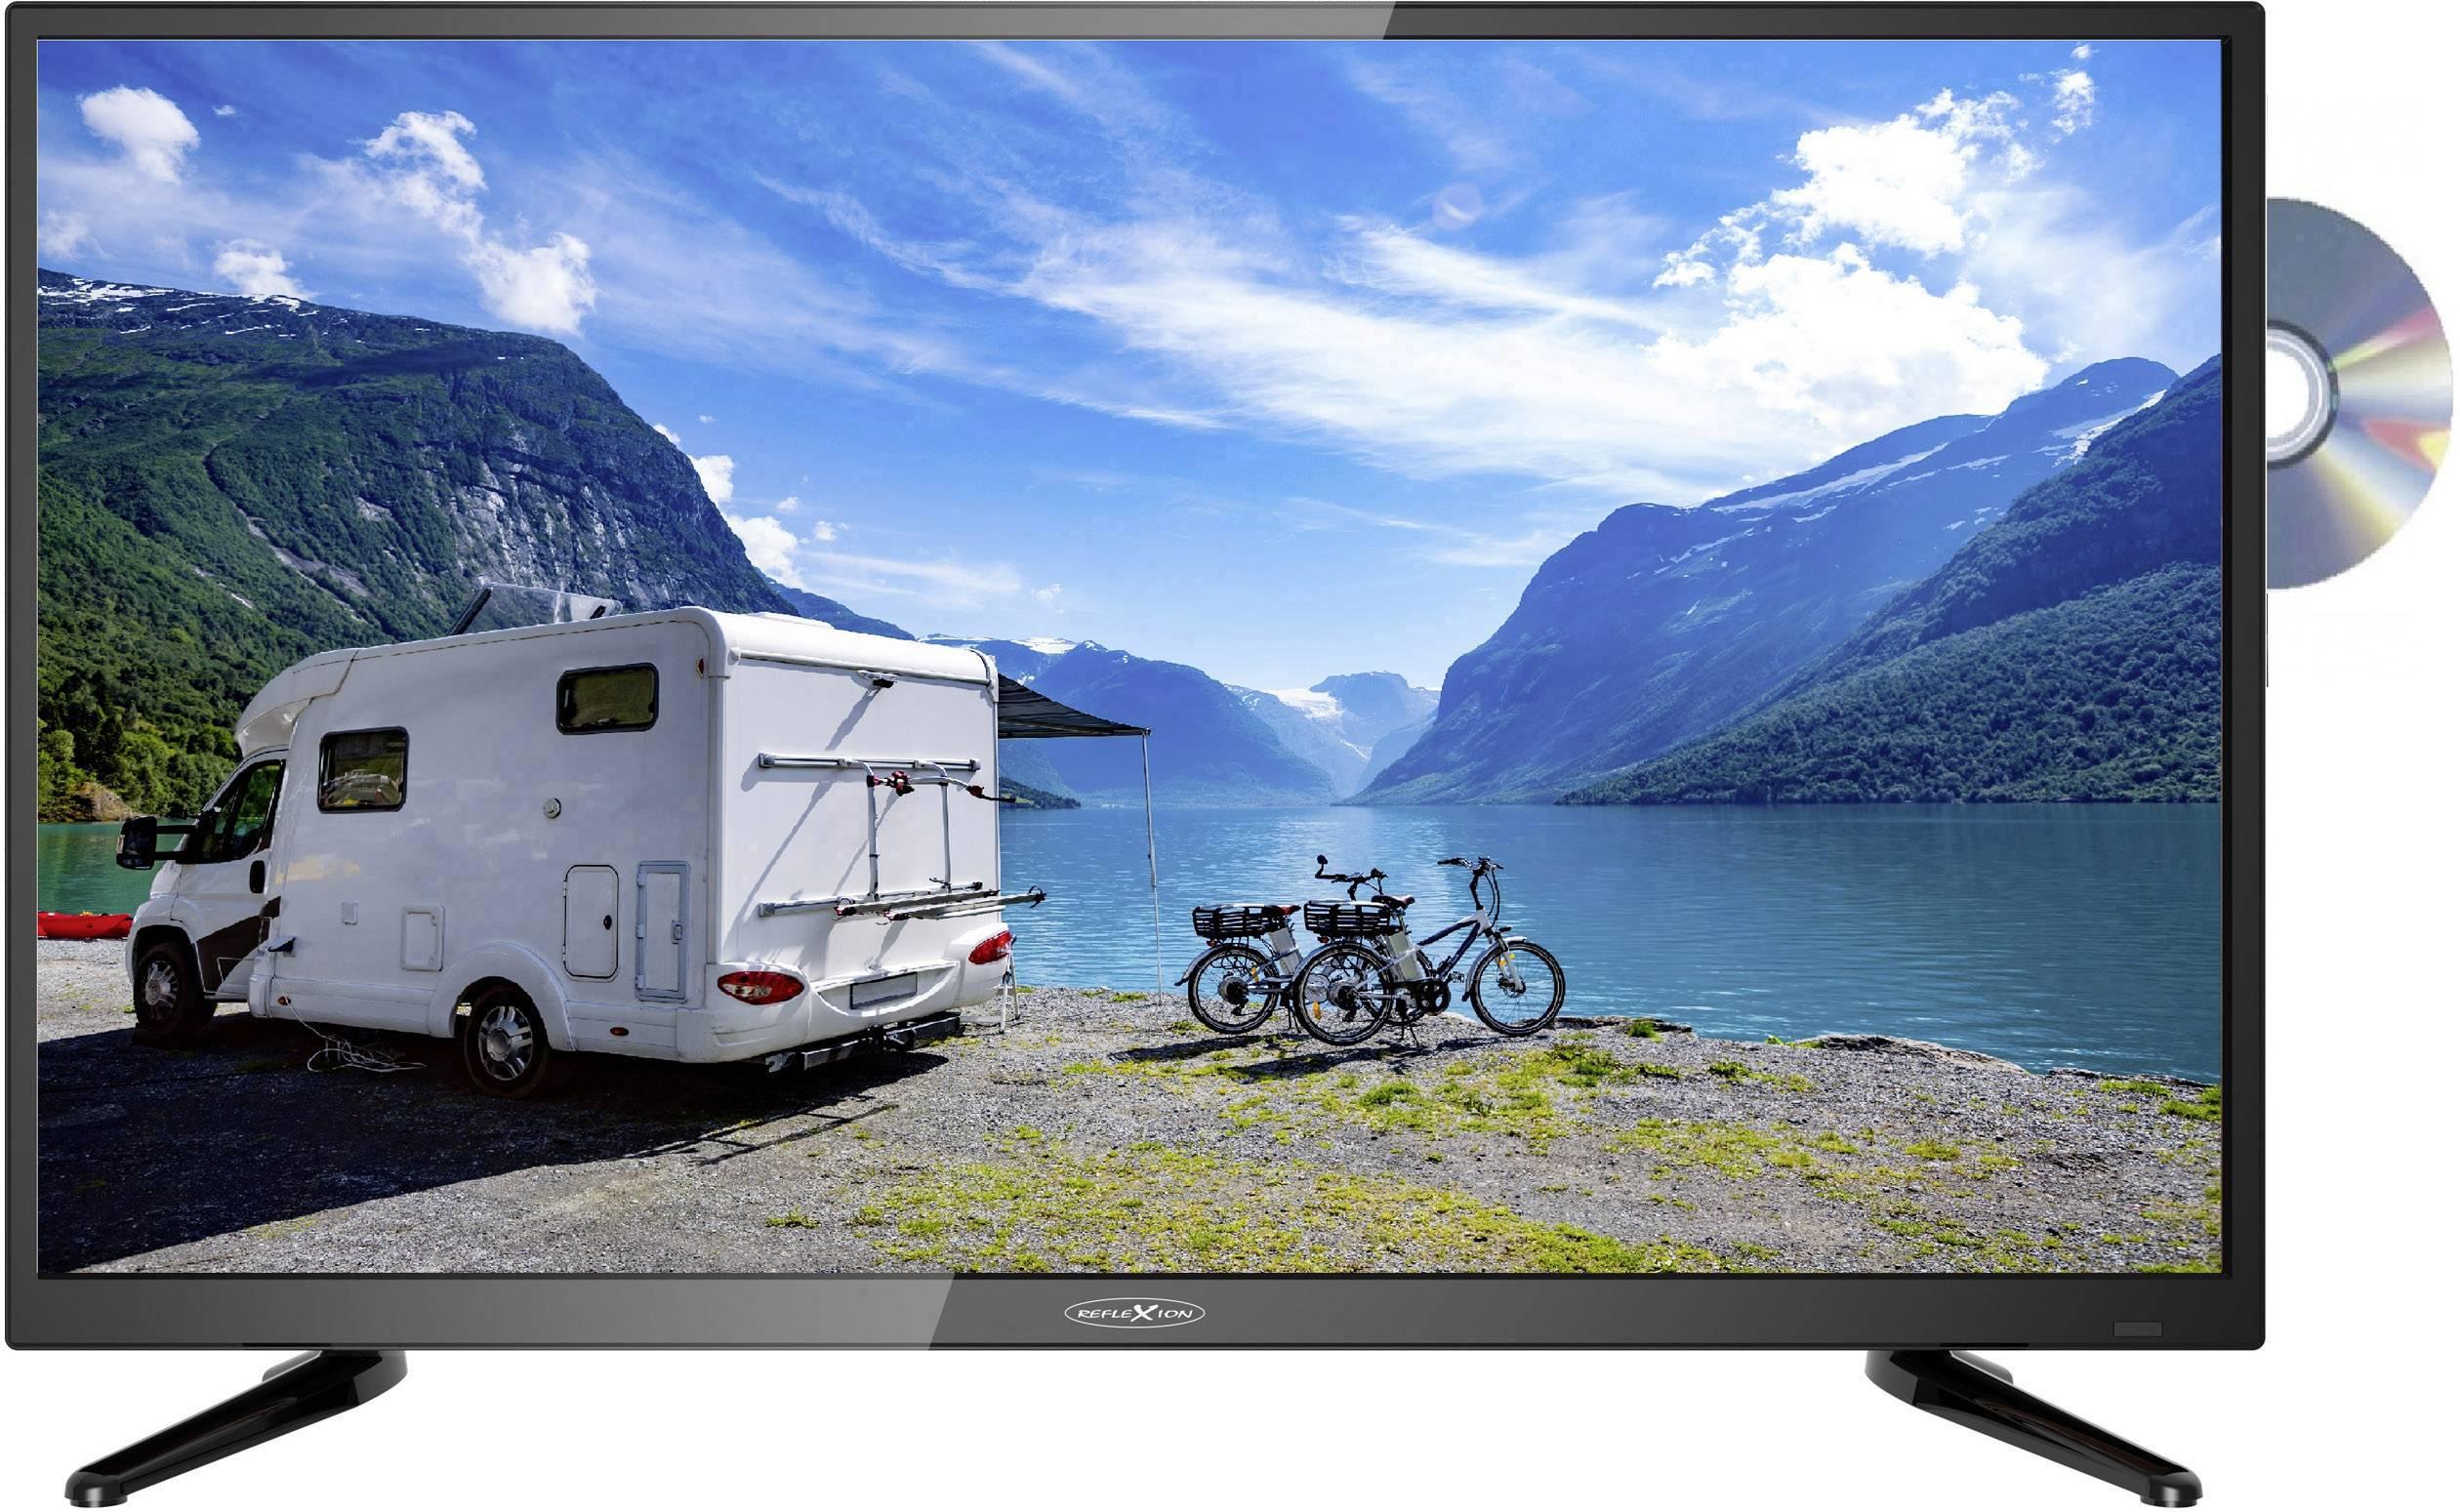 Reflexion LDD4088 TV LED 100 cm 40 pollici Classe energetica A (A+ - F) DVB-T2, DVB-C, DVB-S, Full HD, DVD-Player, CI+